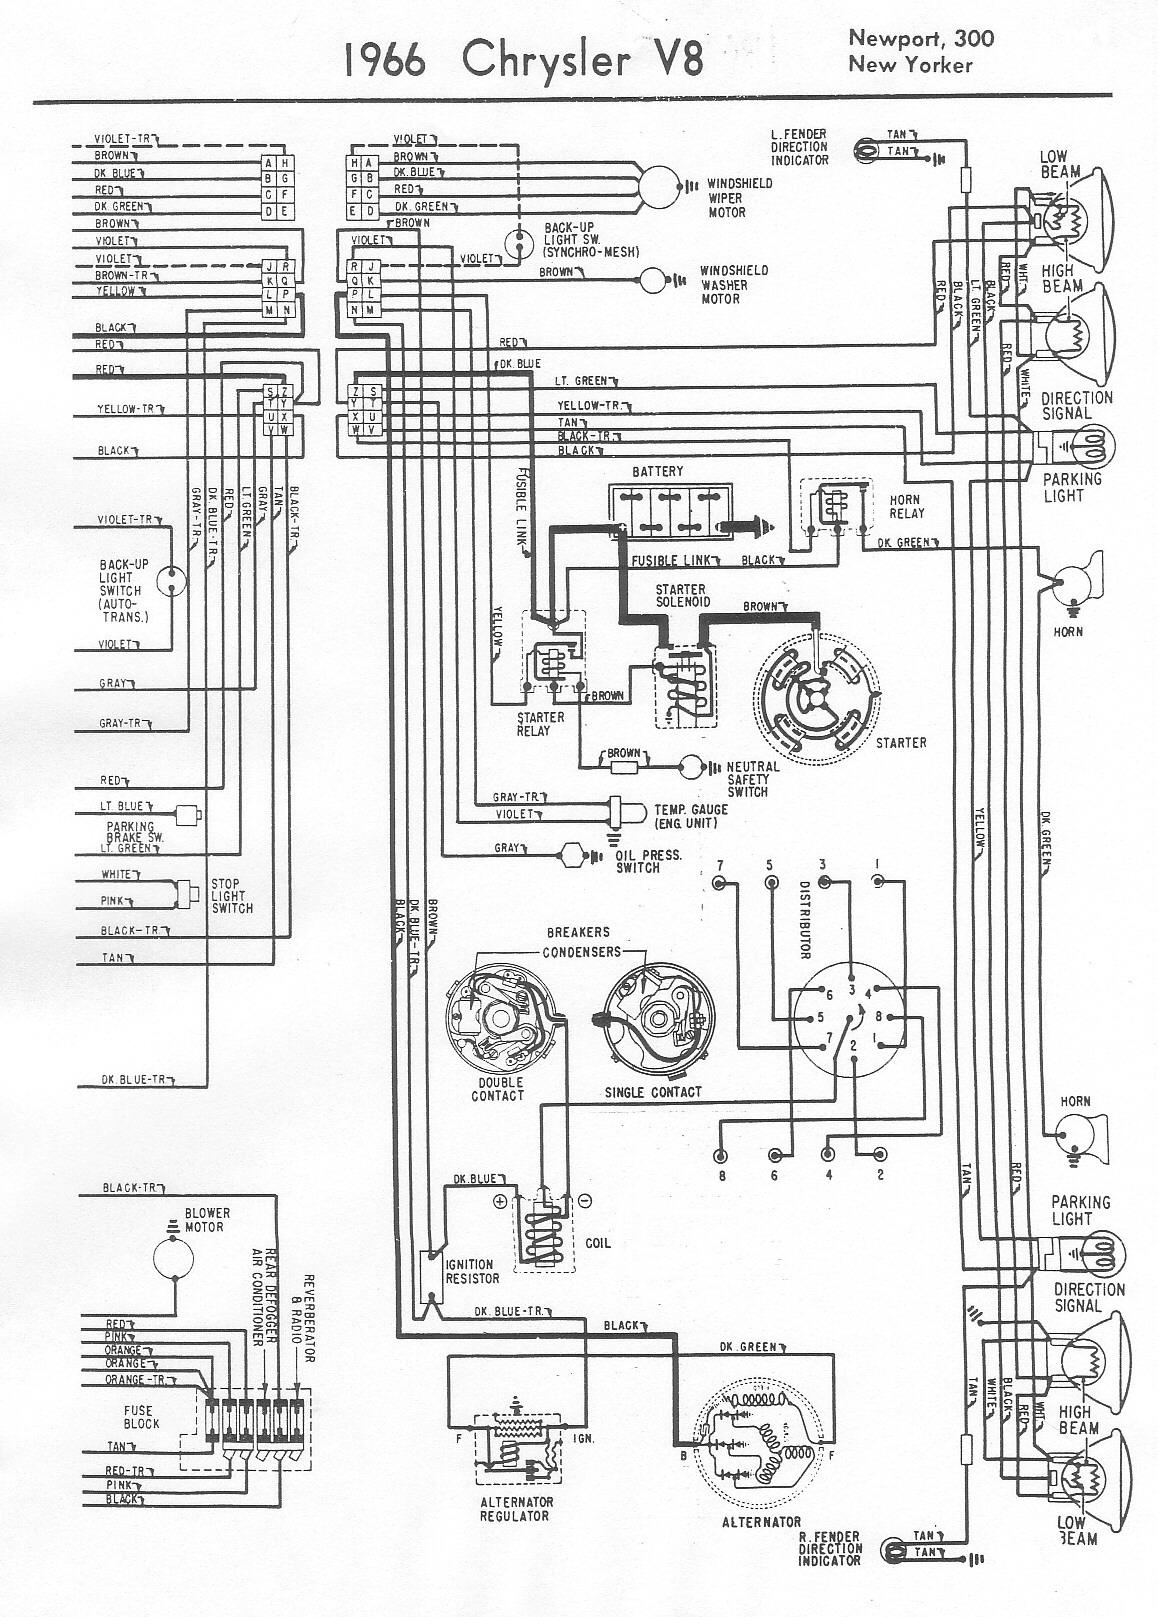 1966 Chrysler New Yorker Wiring Diagram 1956 Chrysler Wiring